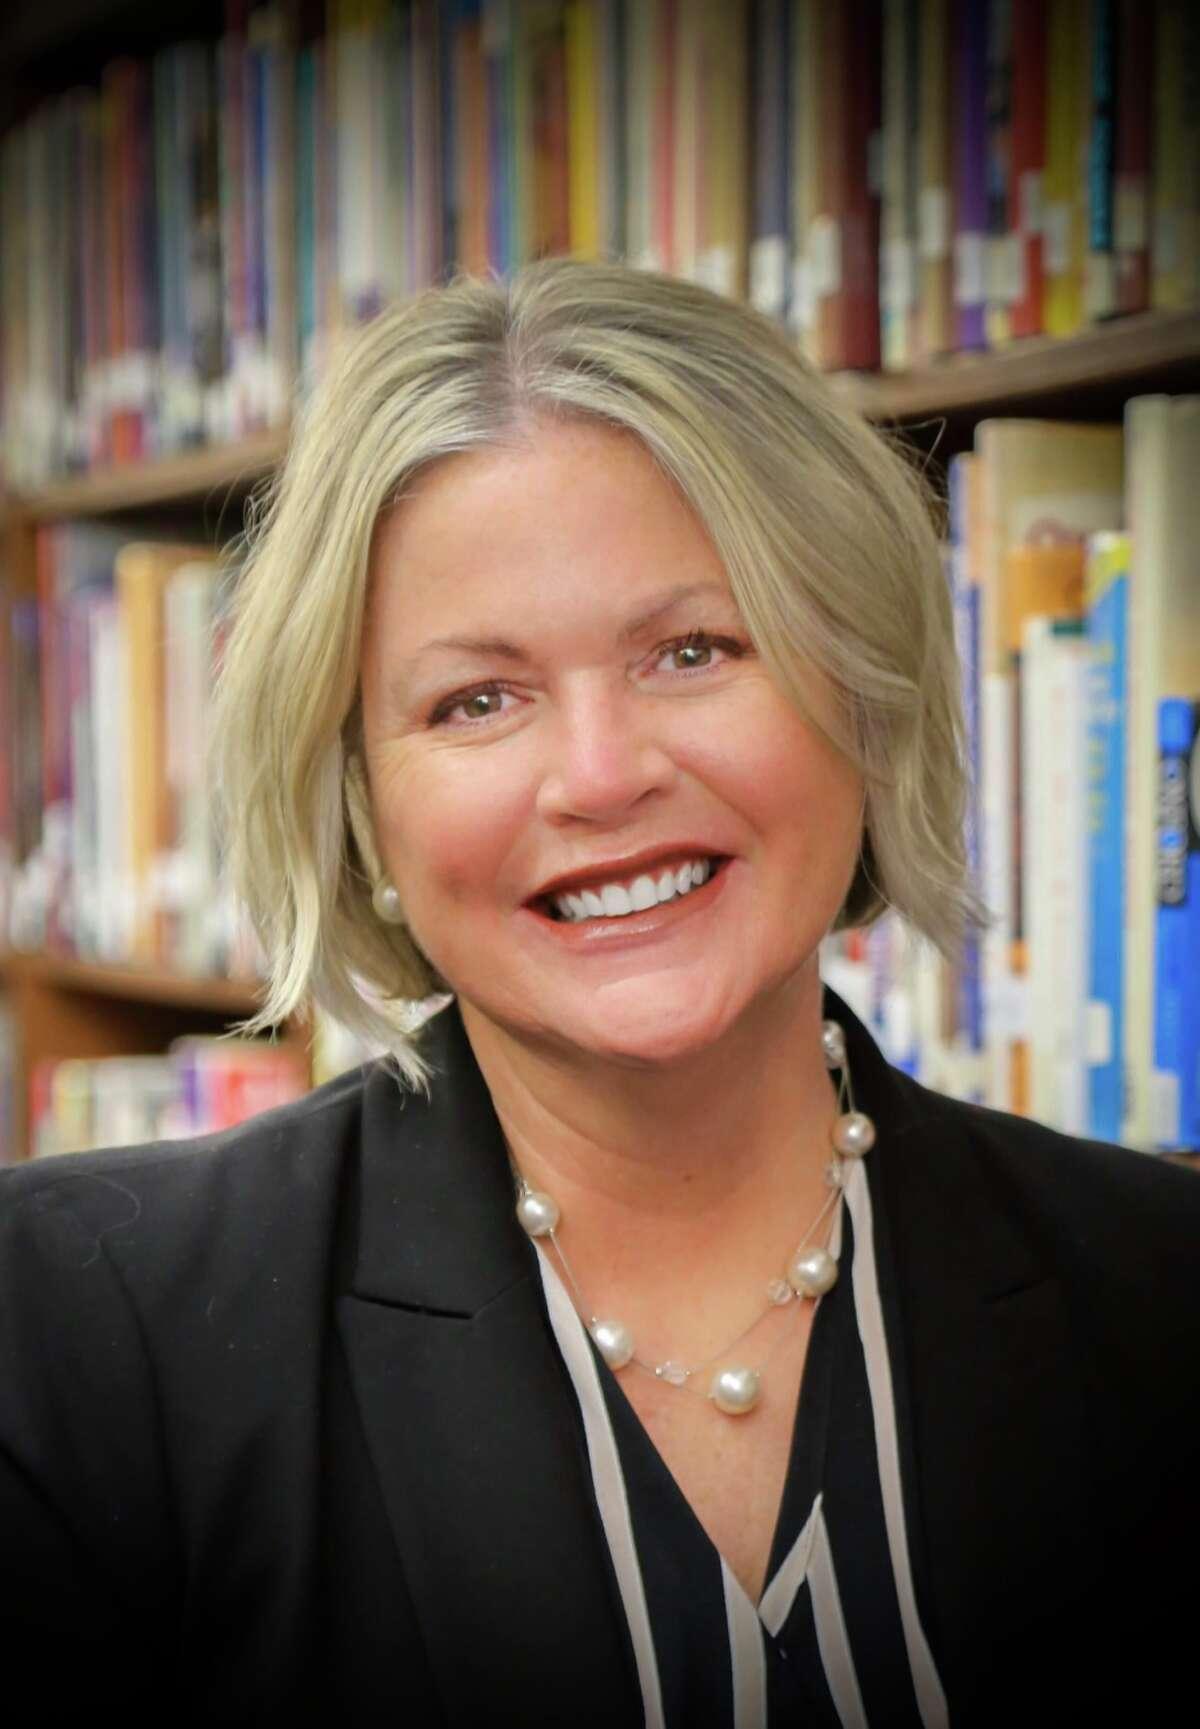 Superintendent of School Lynne Rutnik